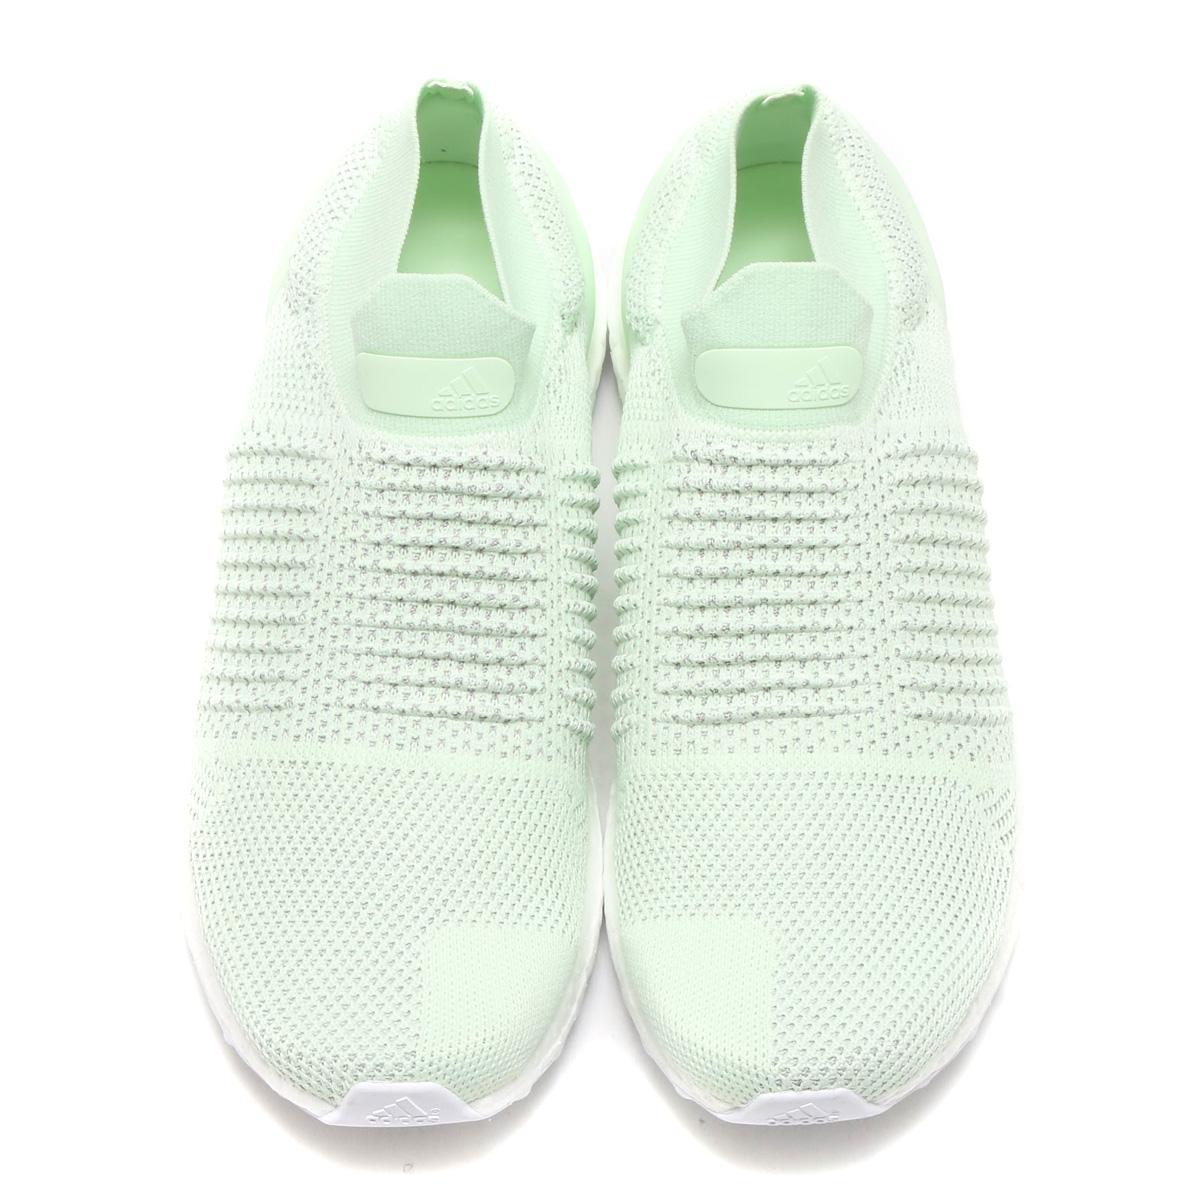 f316dfa10d71e adidas UltraBOOST LACELESS LTD (Adidas ultra boost raceless LTD) Ash Green Aero  Green Ftwr White 18SS-S